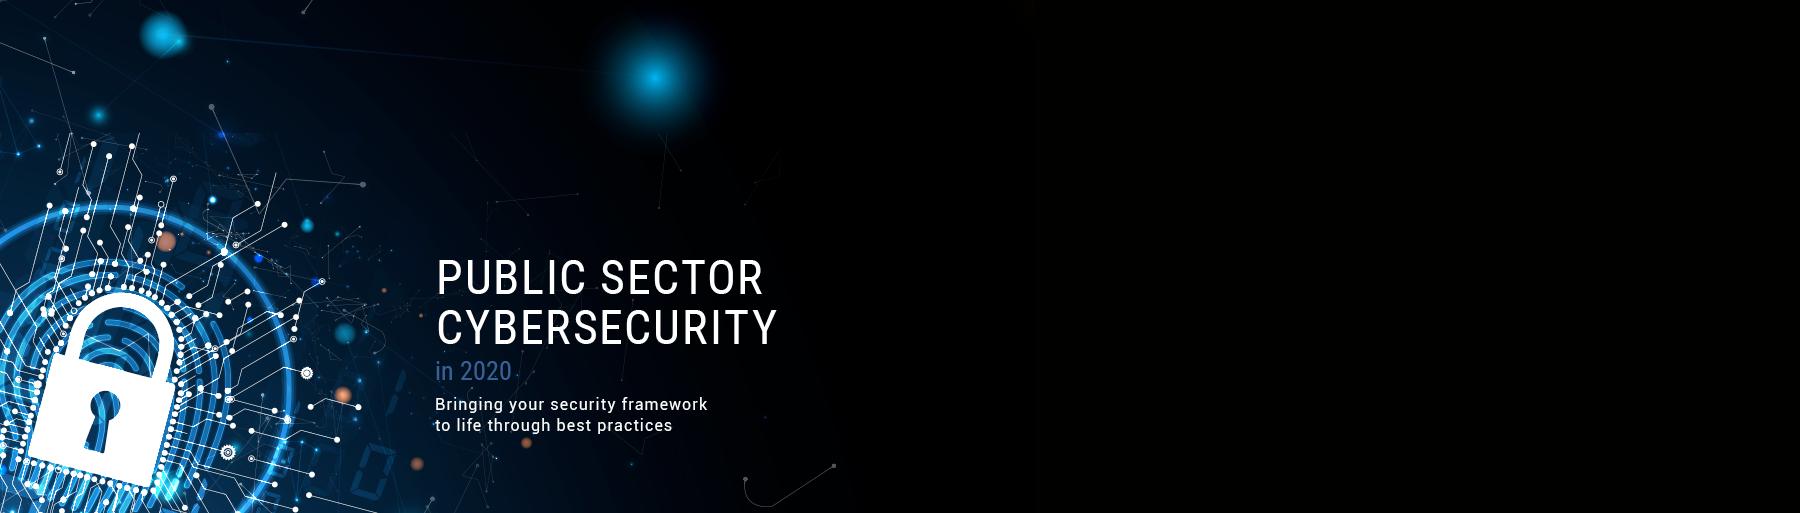 public sector cybersecurity-LP header-1